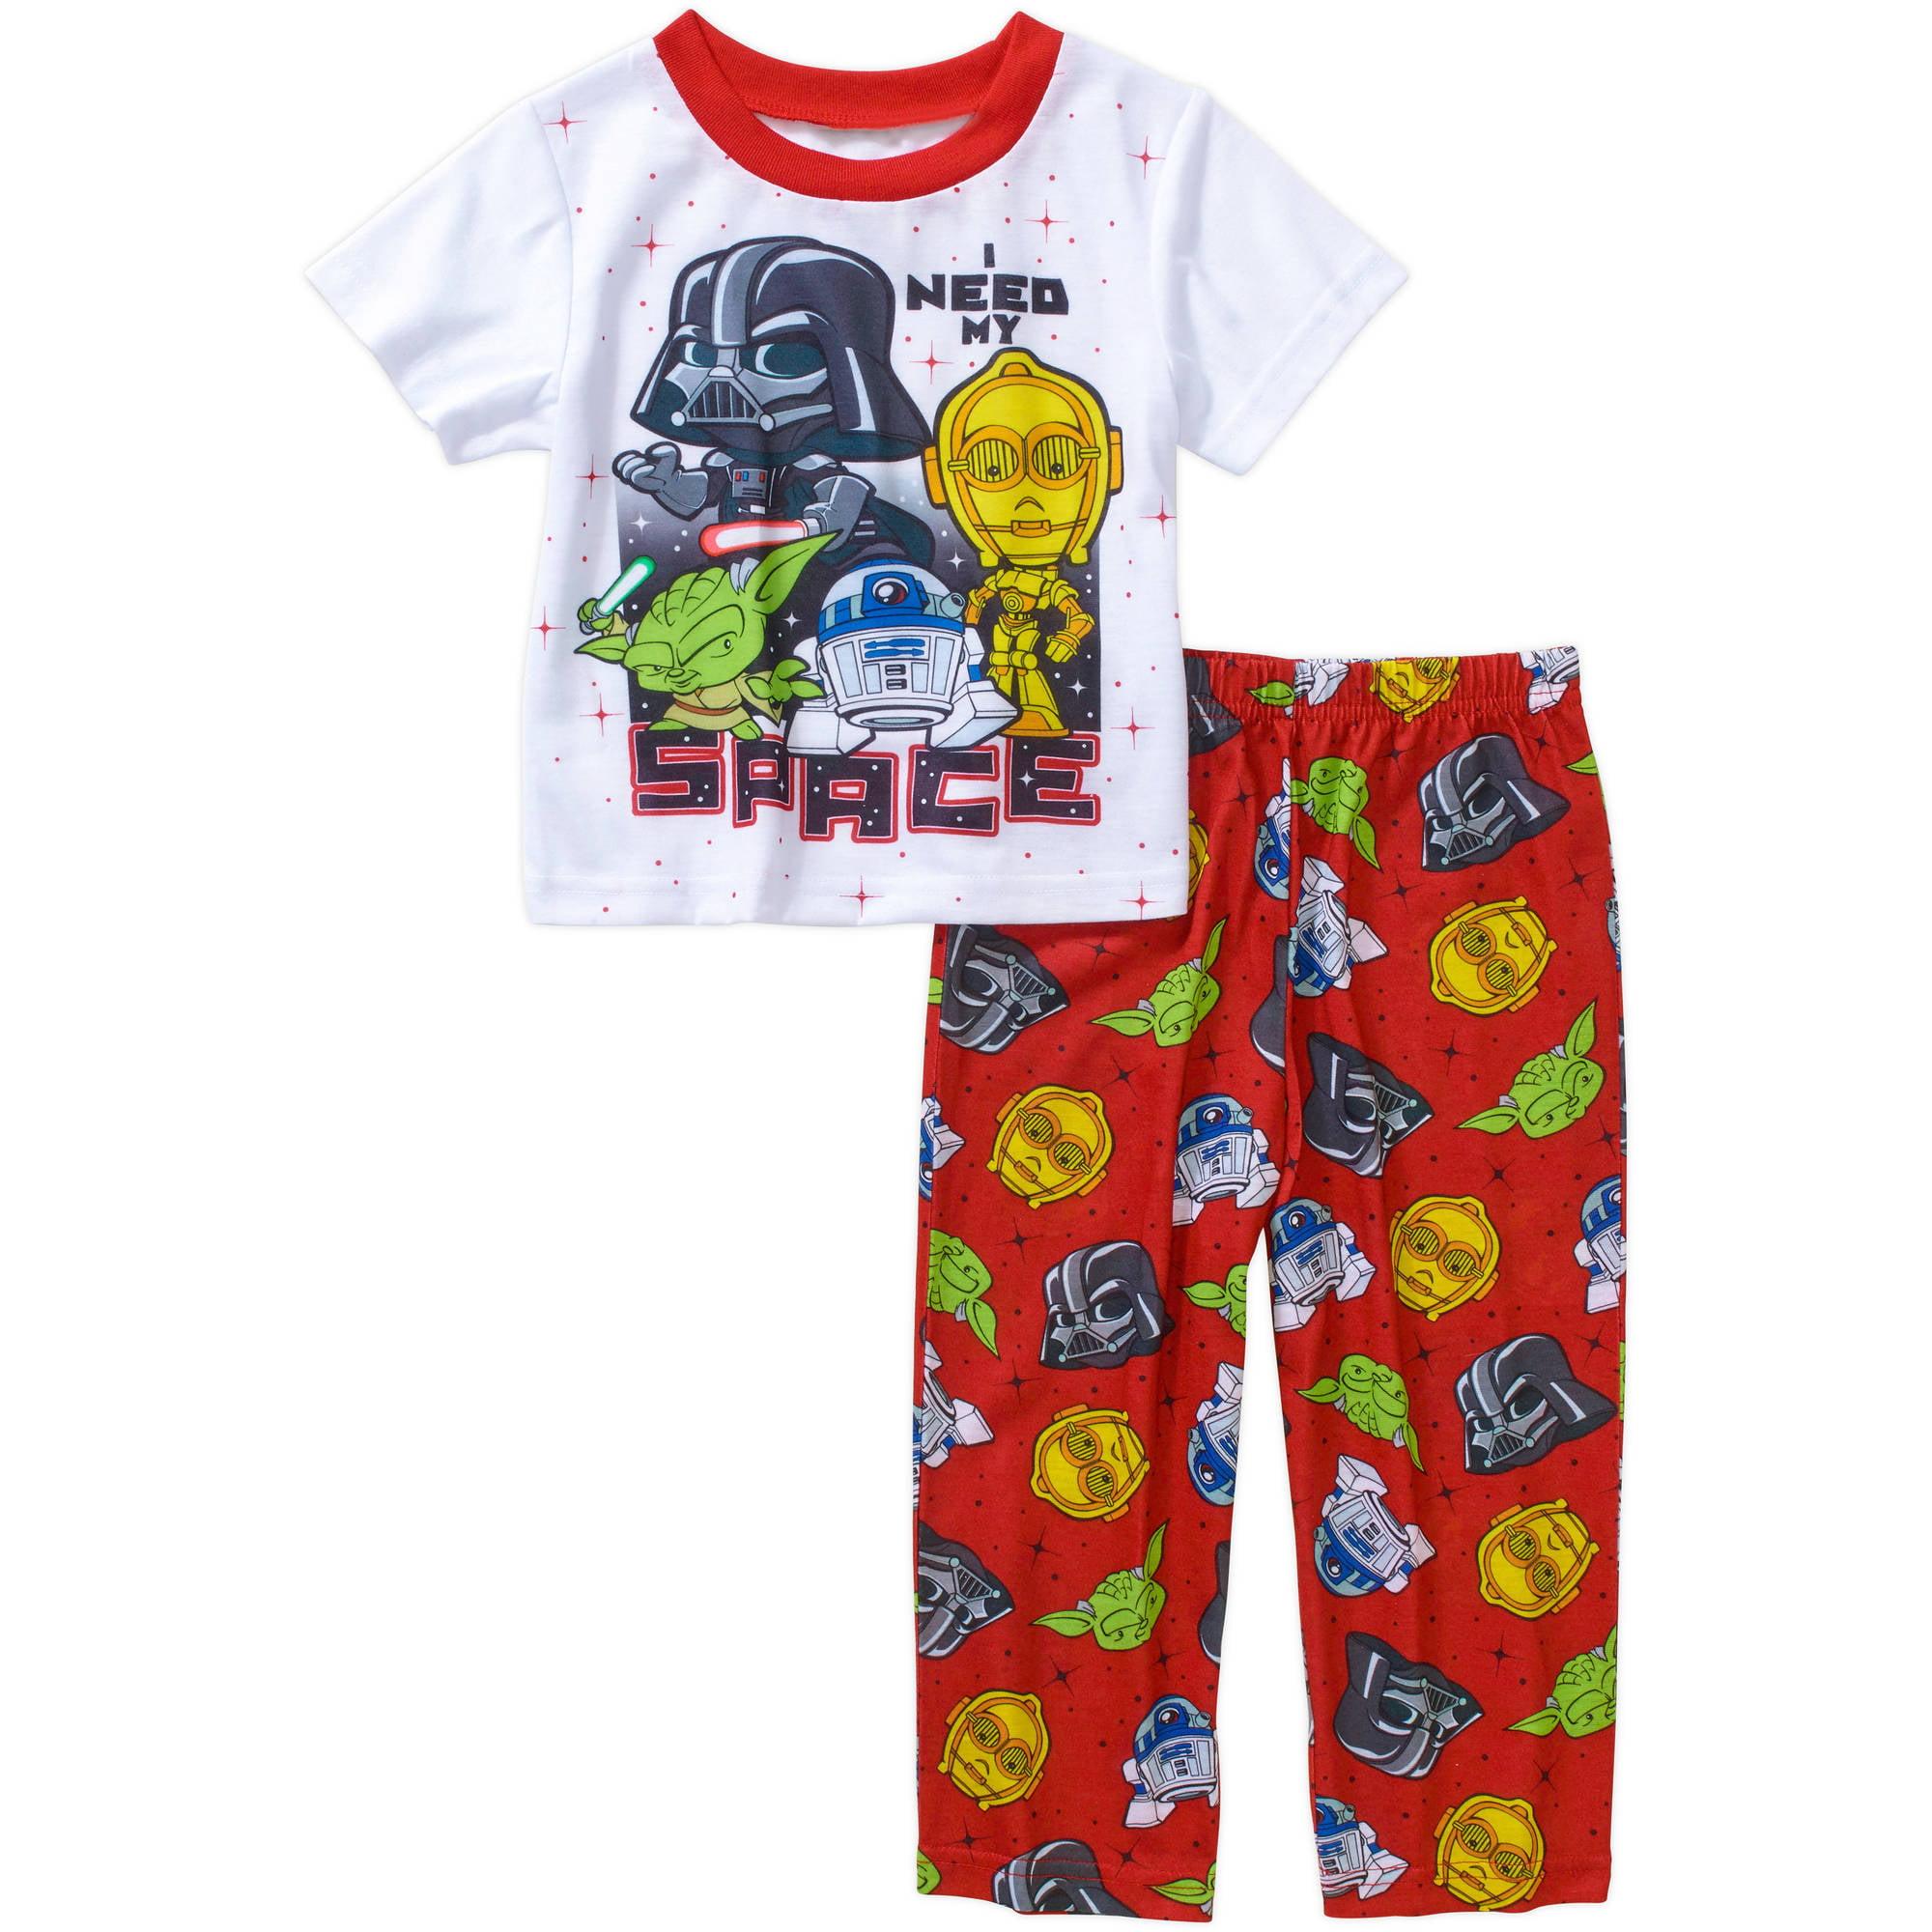 Star Wars Toddler Boy Short Sleeve Pajama Sleepwear Set